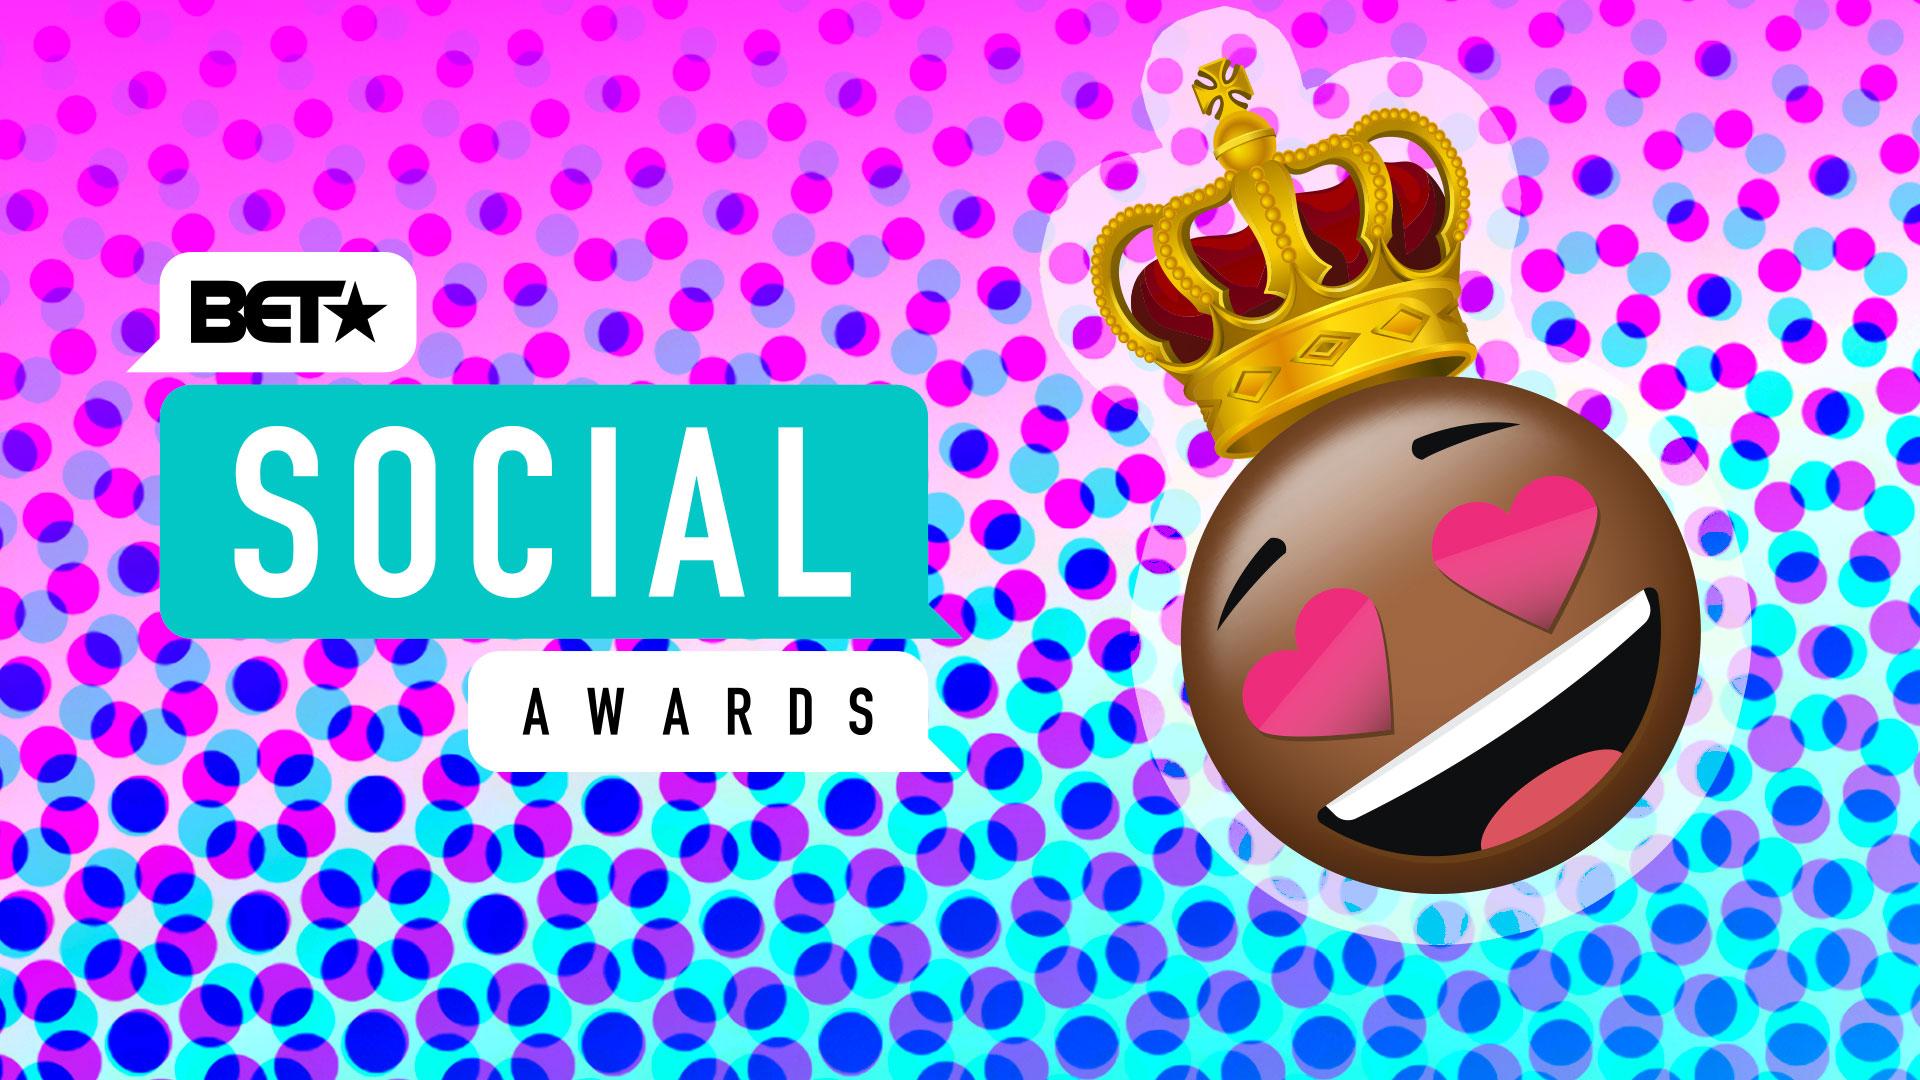 The BET Social Awards 2019